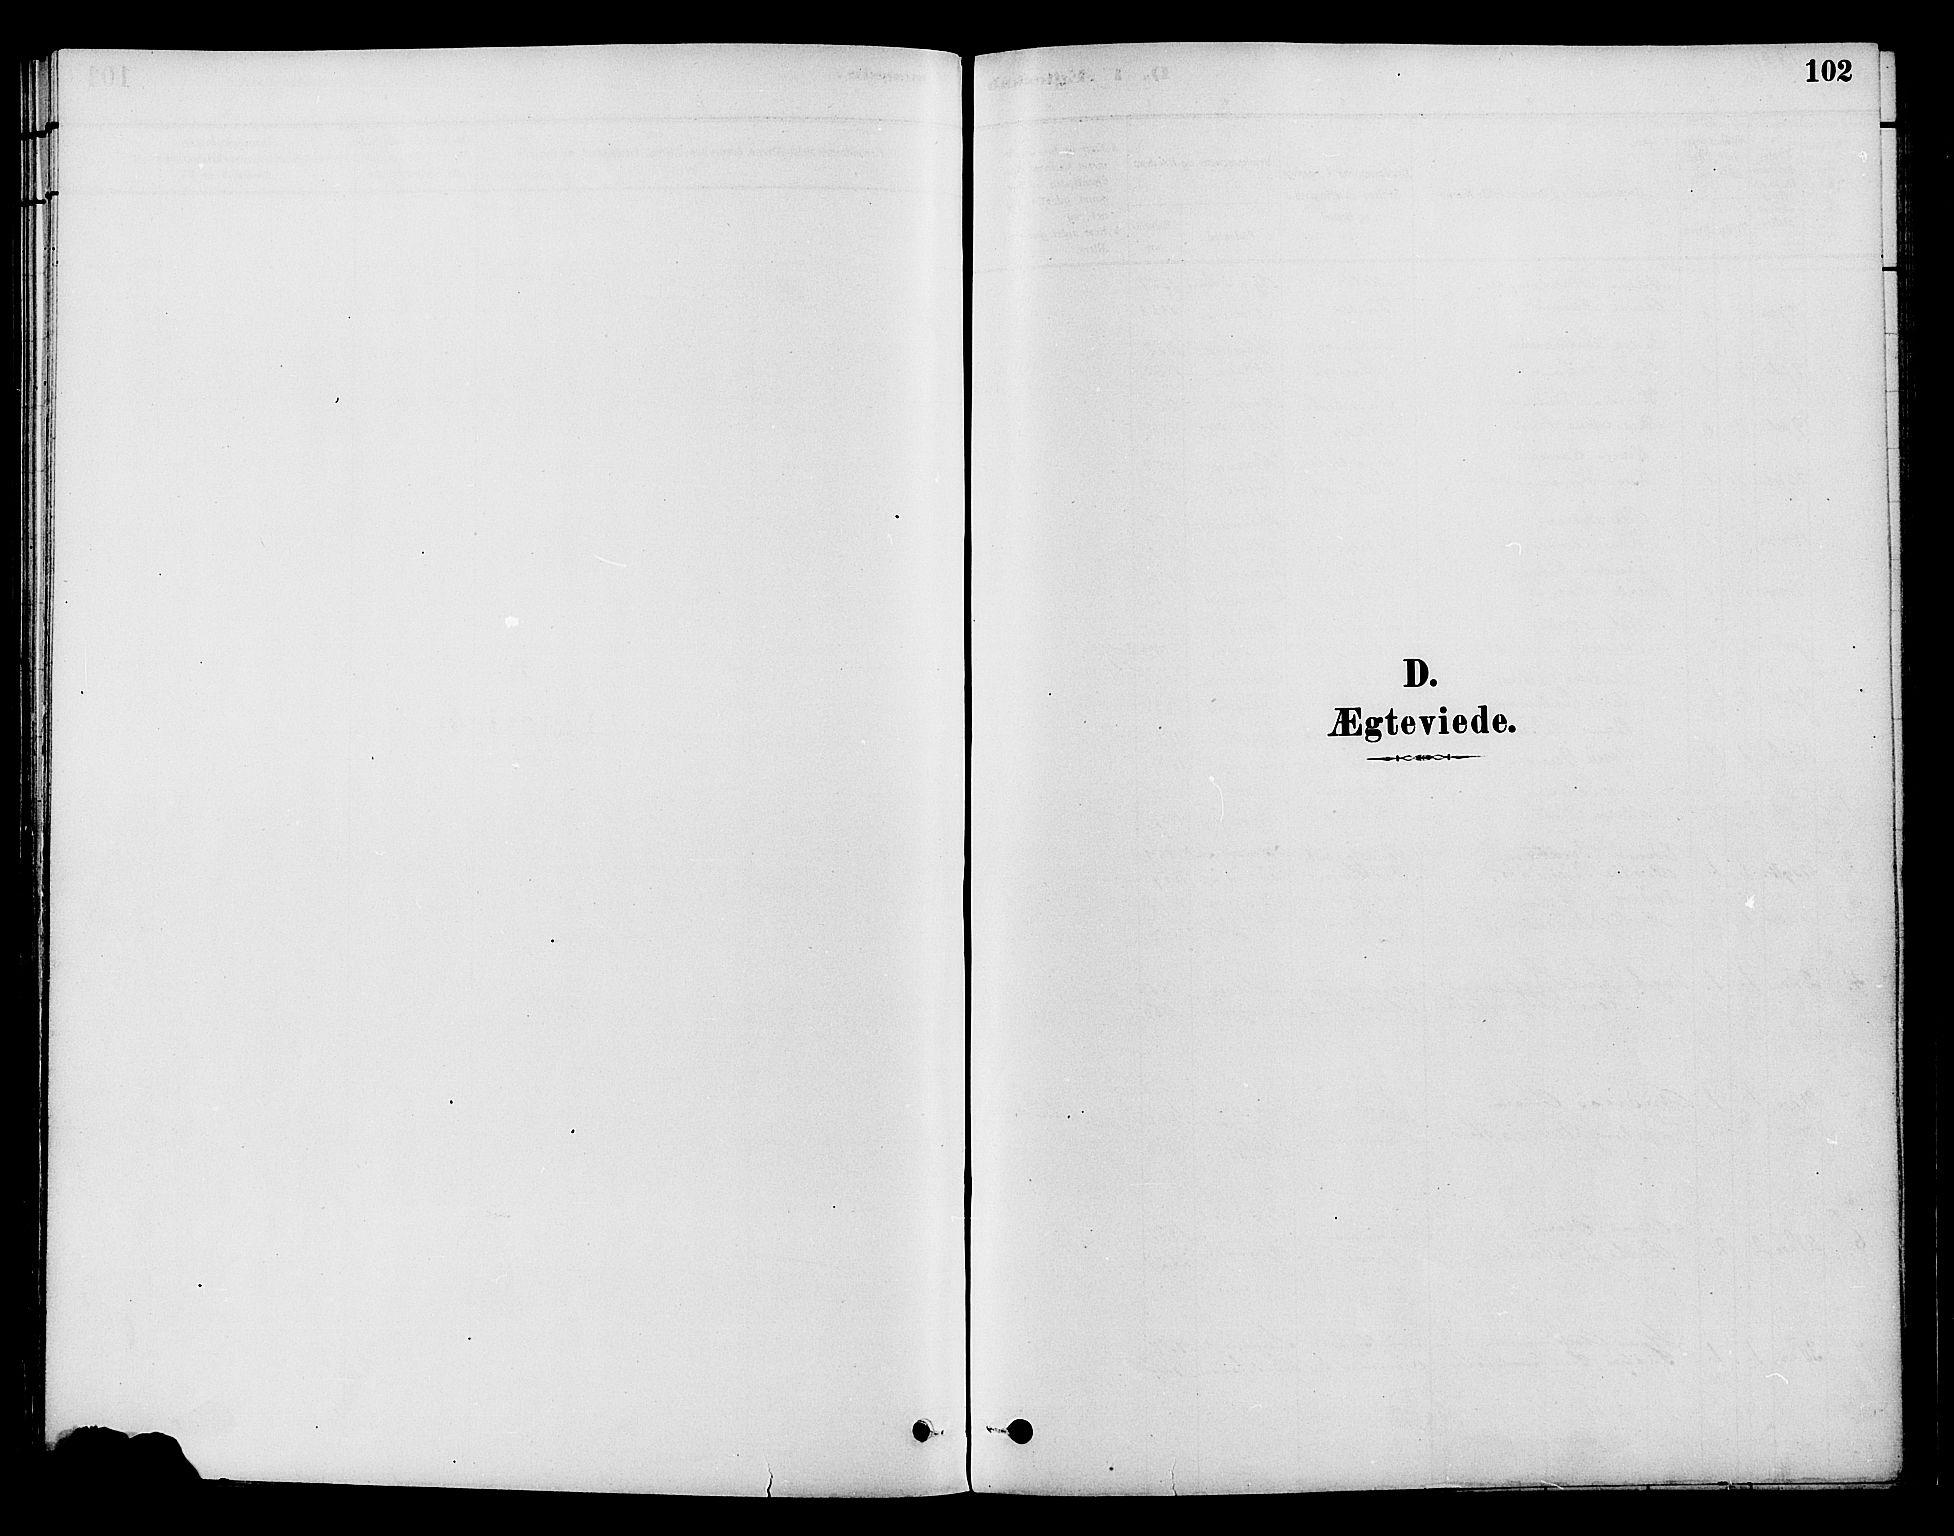 SAH, Gran prestekontor, Parish register (official) no. 15, 1880-1888, p. 102